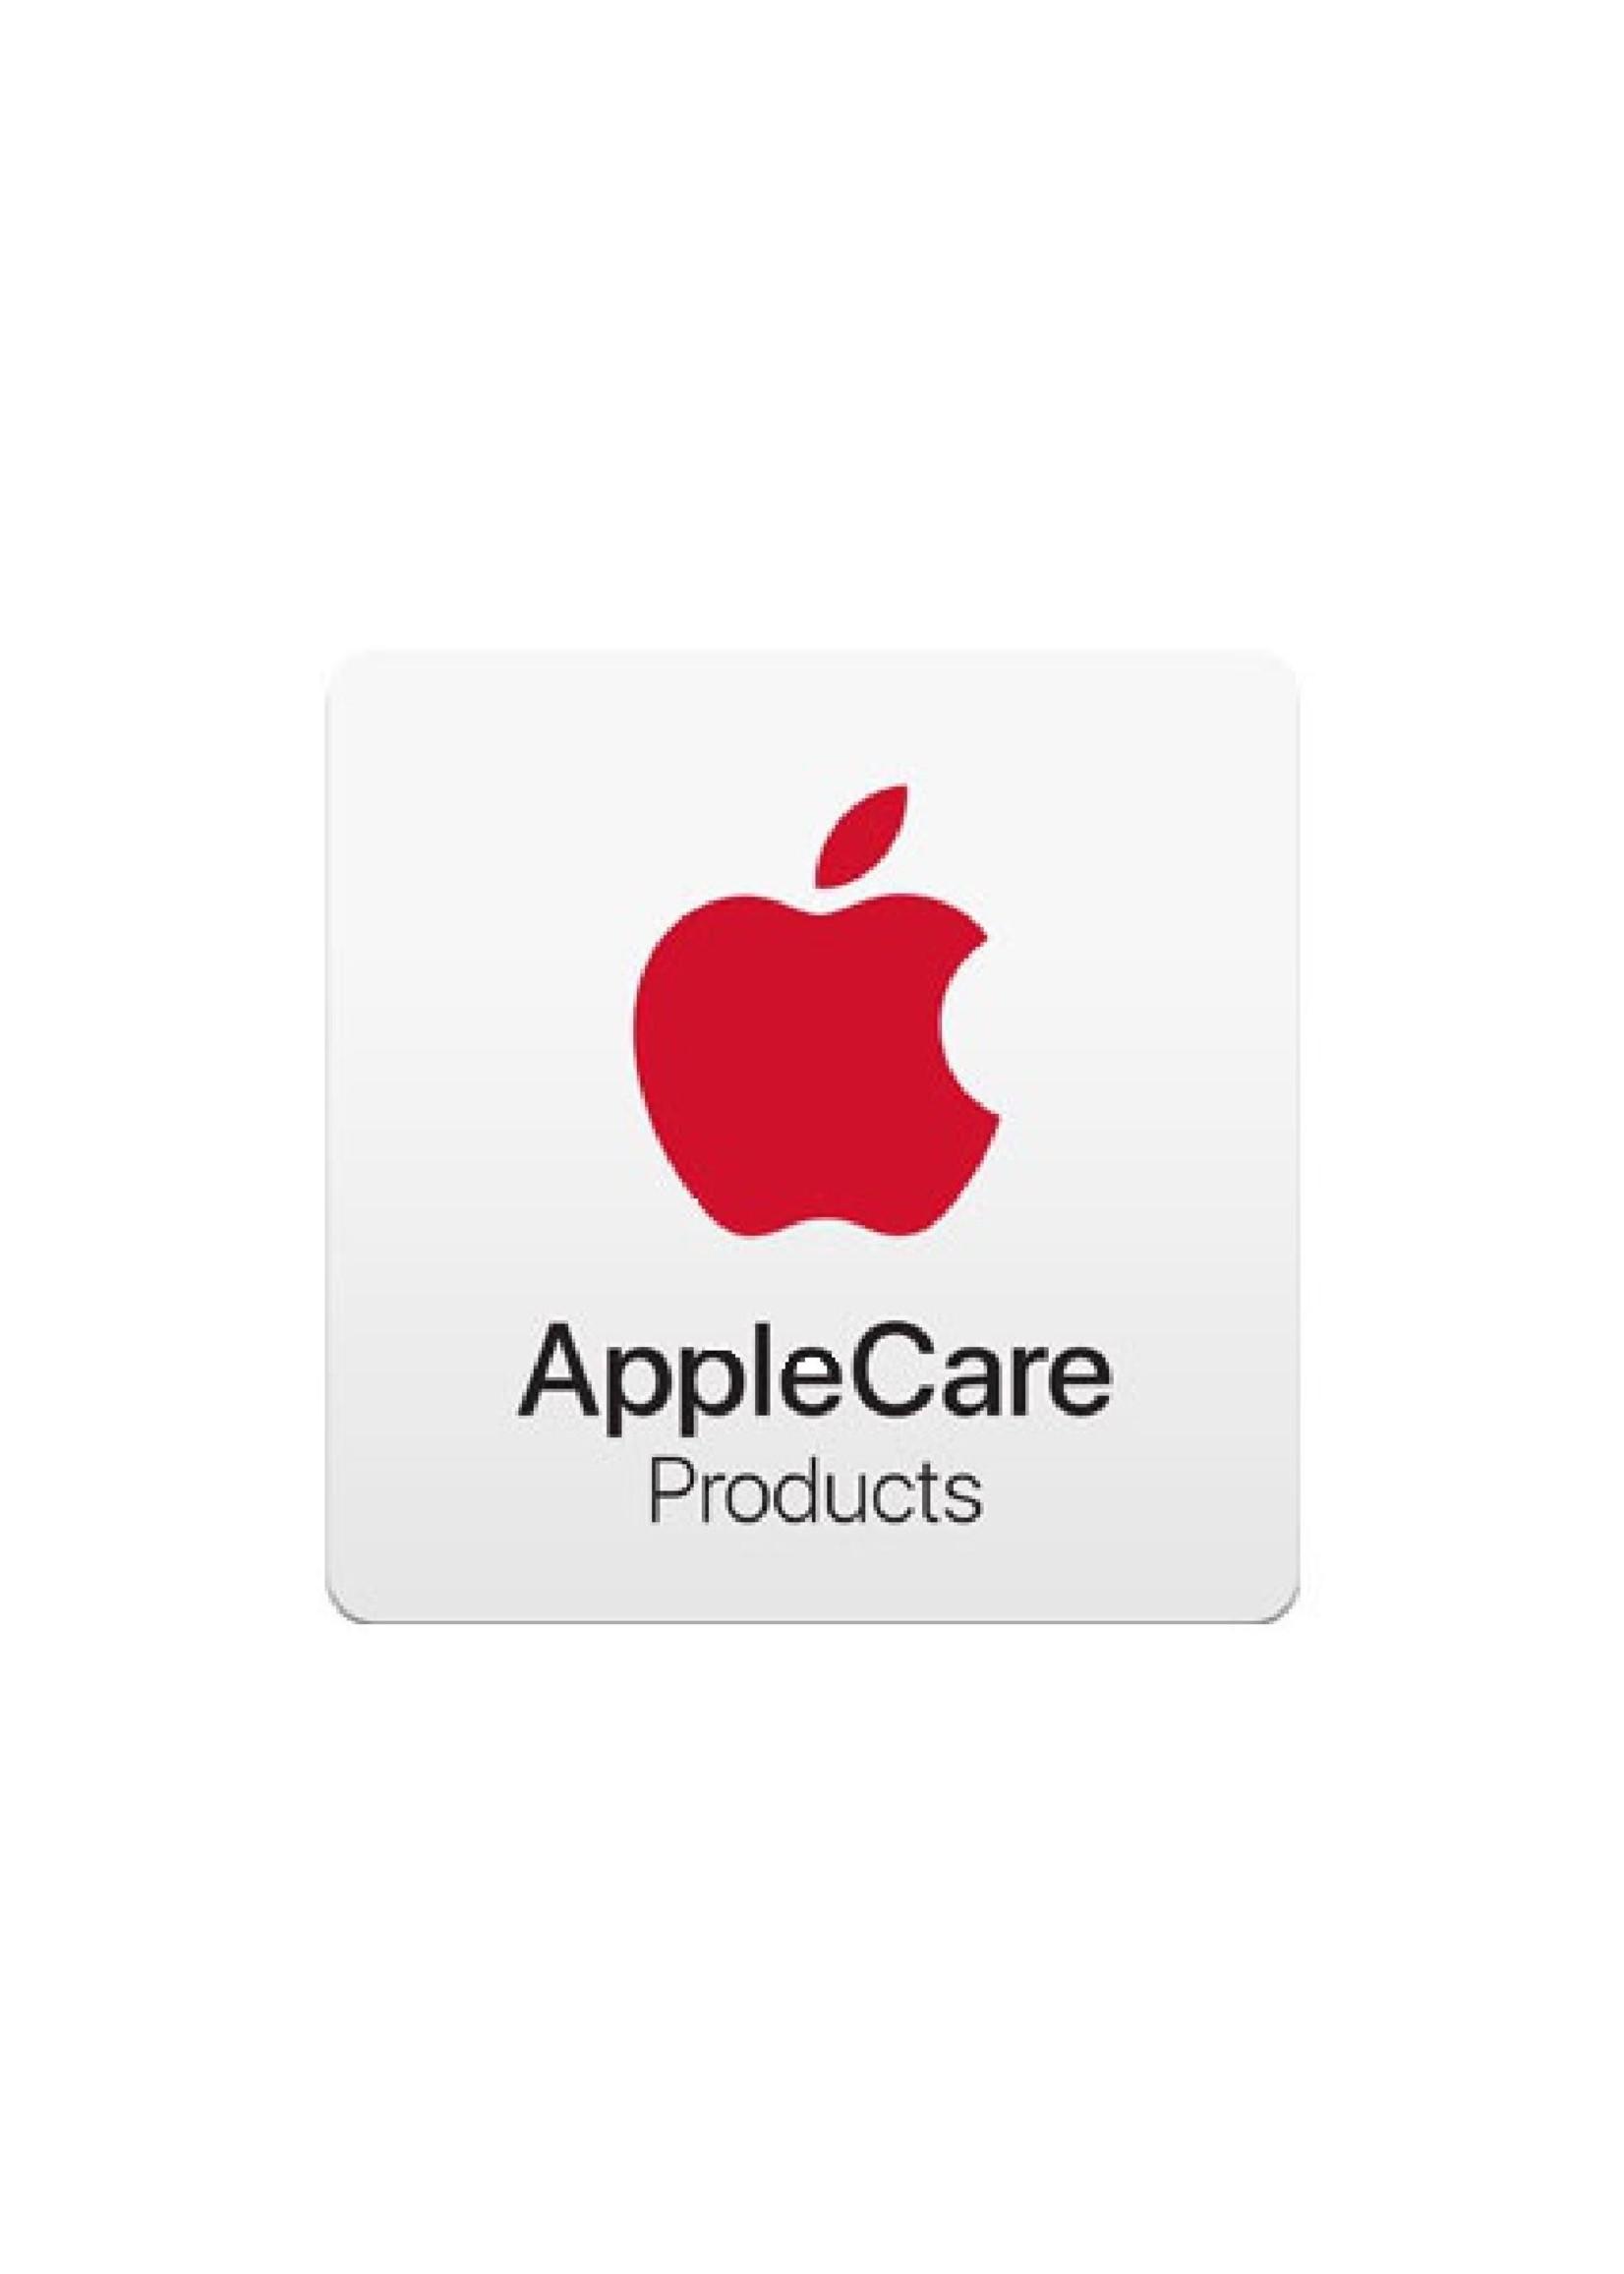 Apple AppleCare for iPad / iPad Air / iPad mini